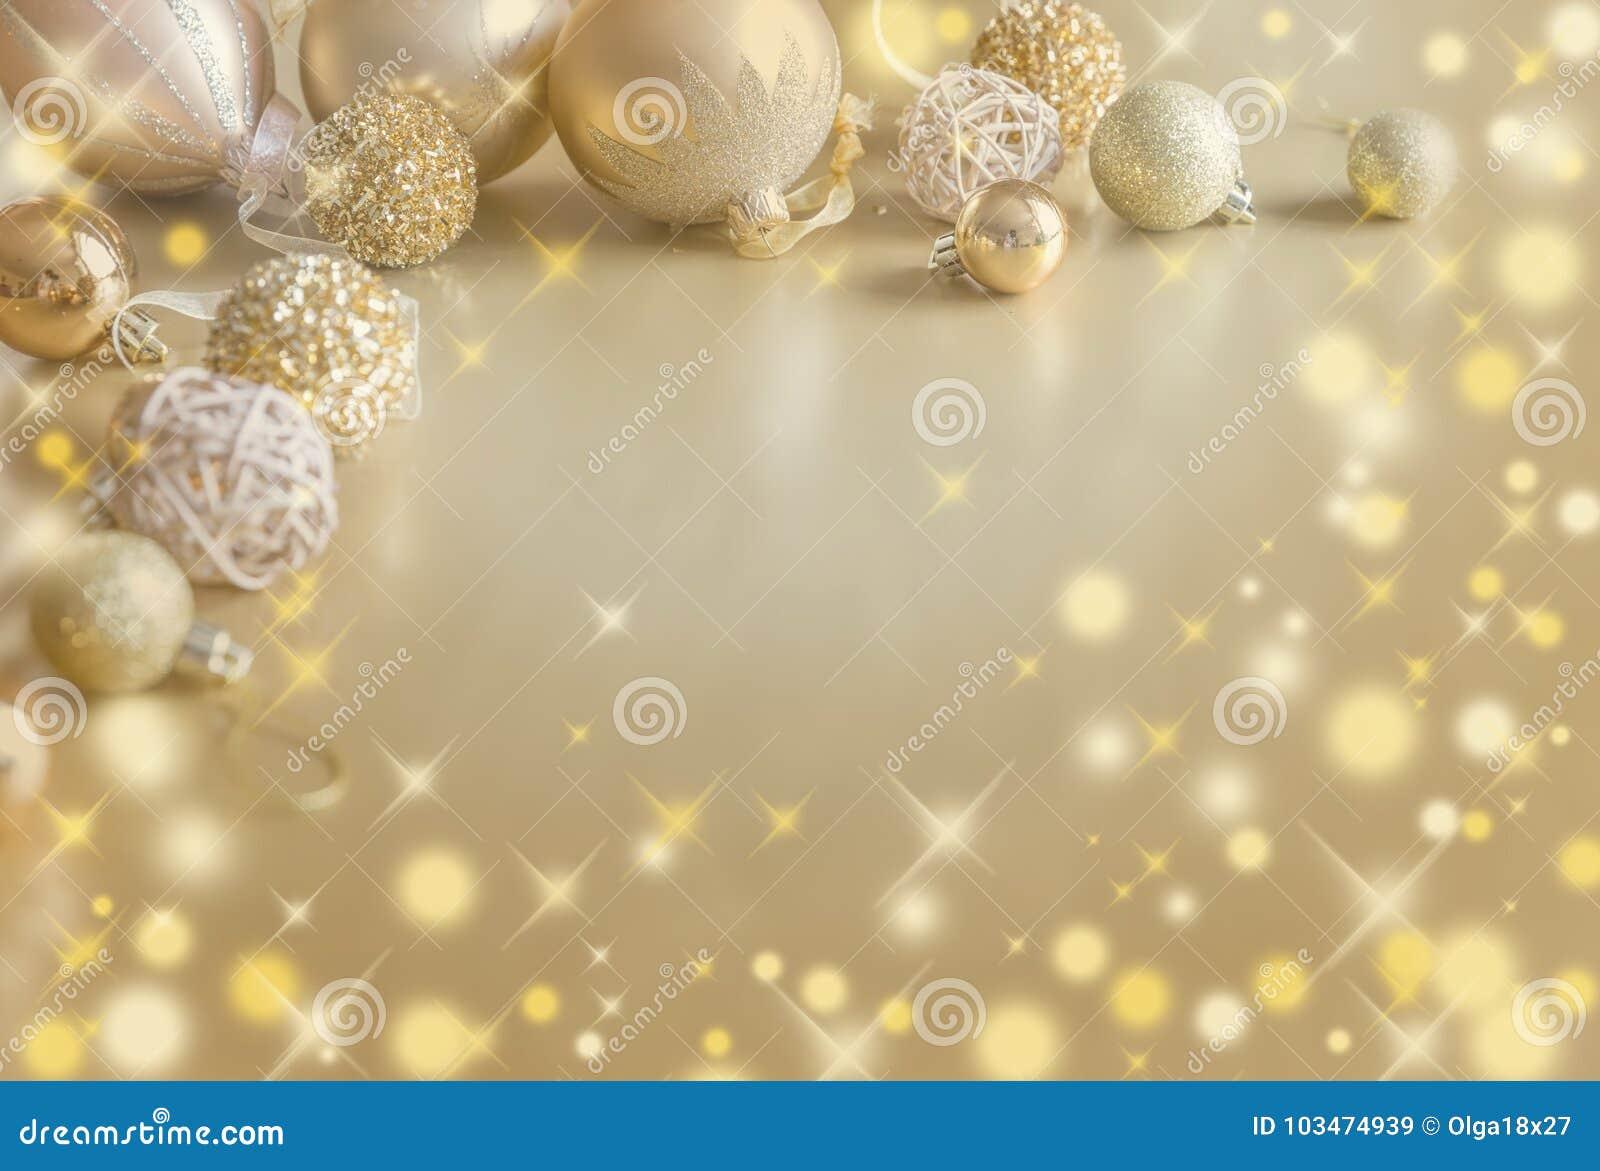 Gold Festive Christmas background. Christmas ball golden decoration.